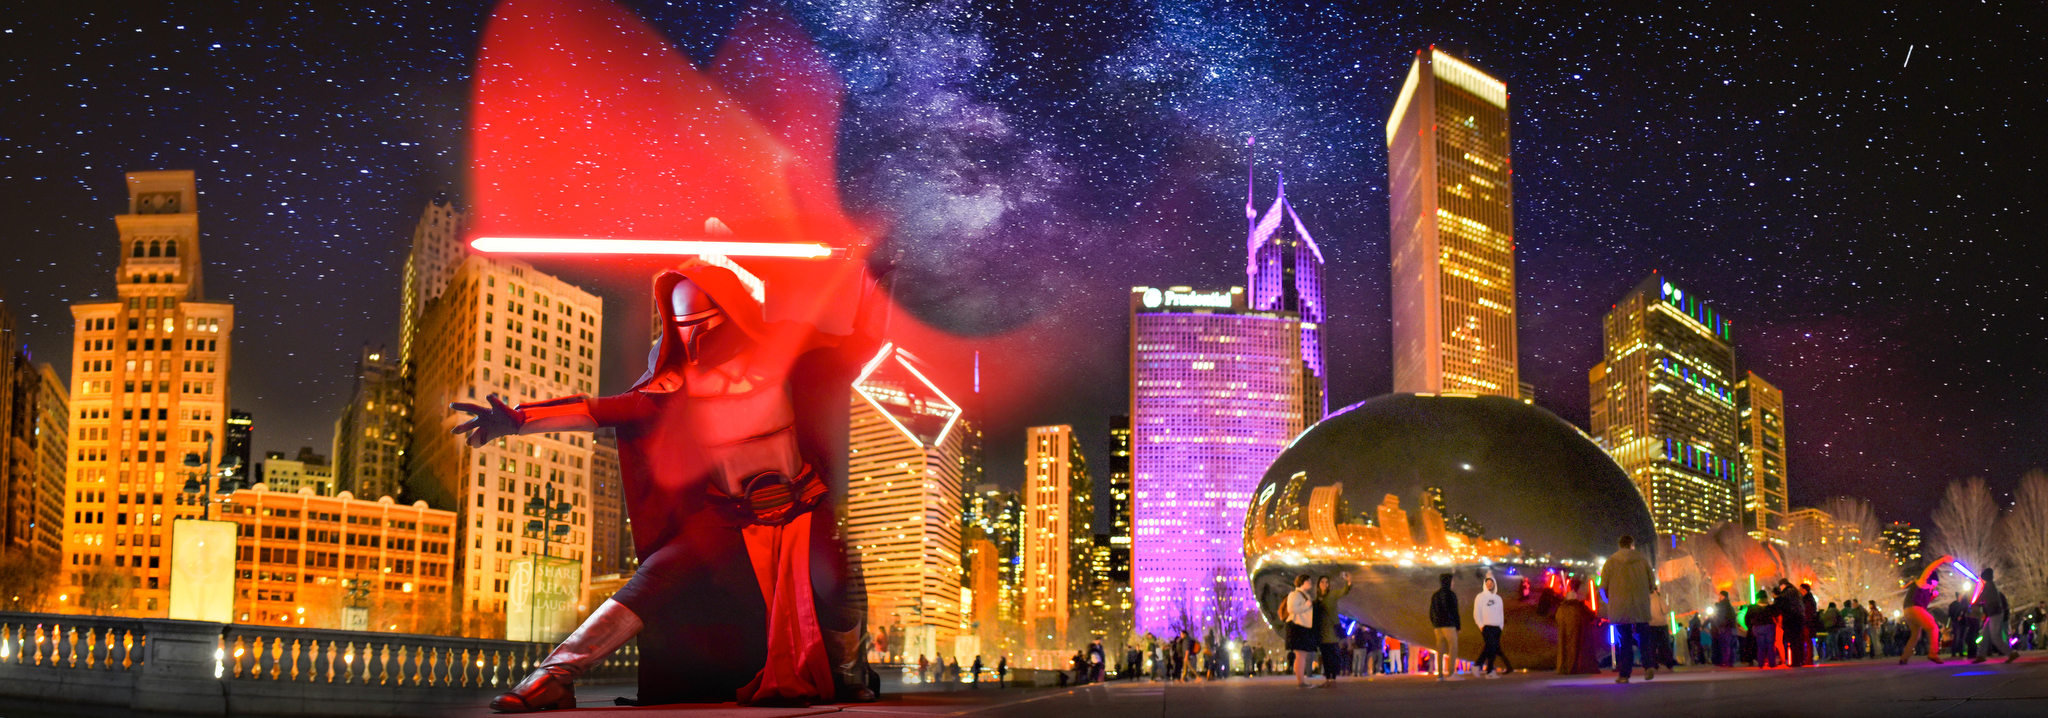 2019.04.14 - Star Wars Celebration Chicago 288852.JPG